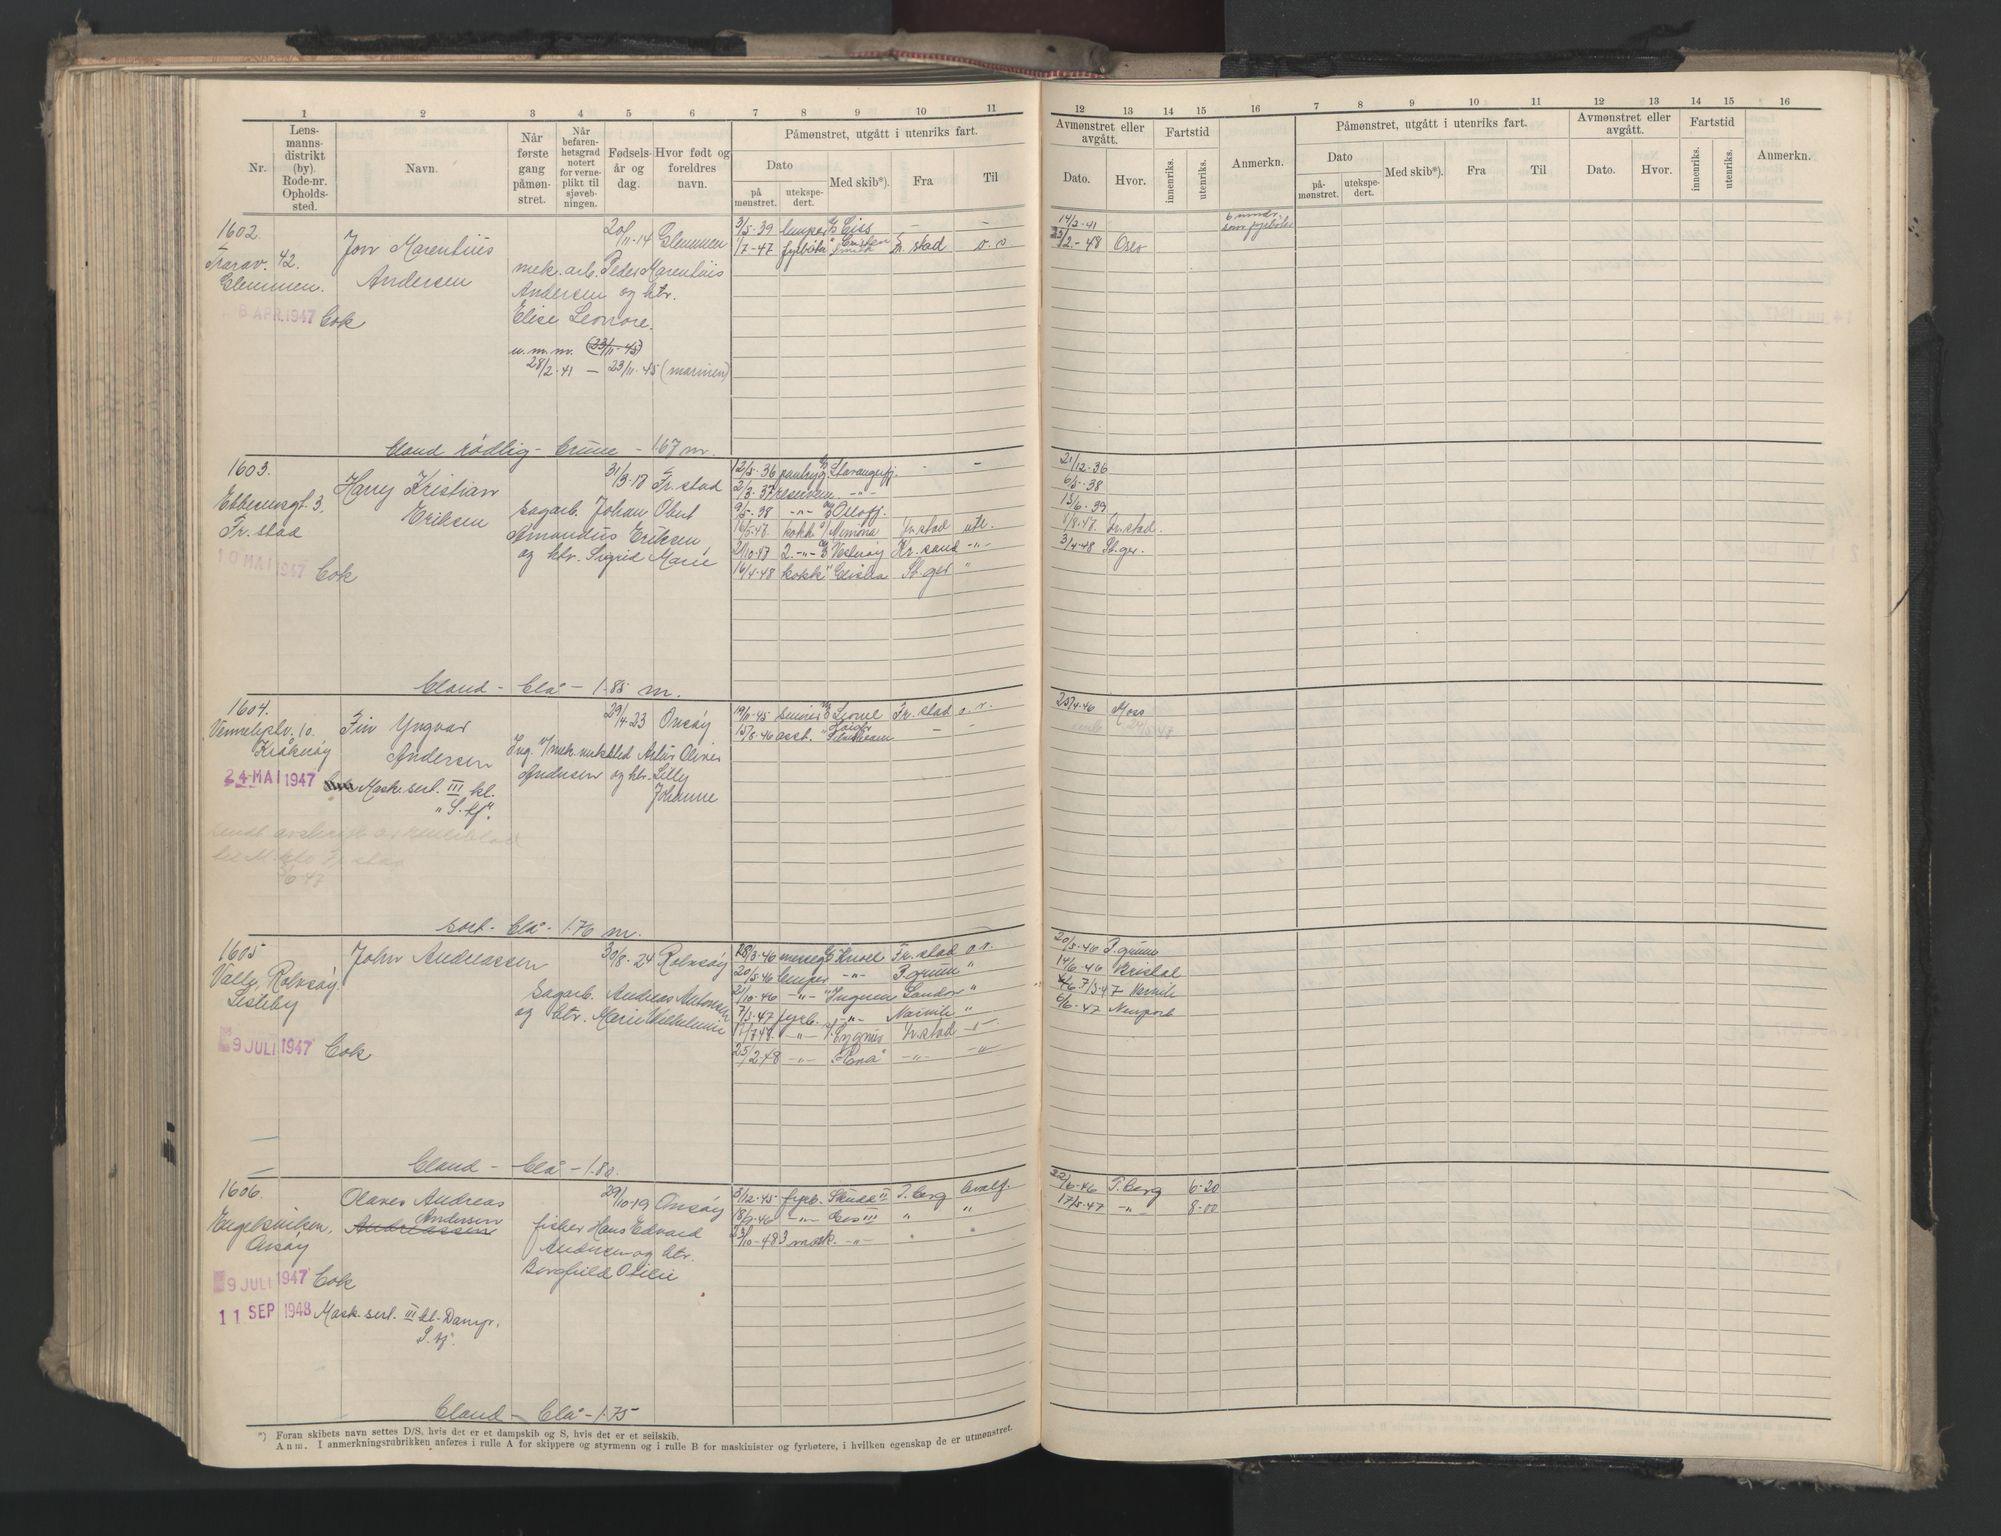 SAO, Oslo sjømannskontor, F/Fd/L0008: B-rulle, 1914, s. upaginert